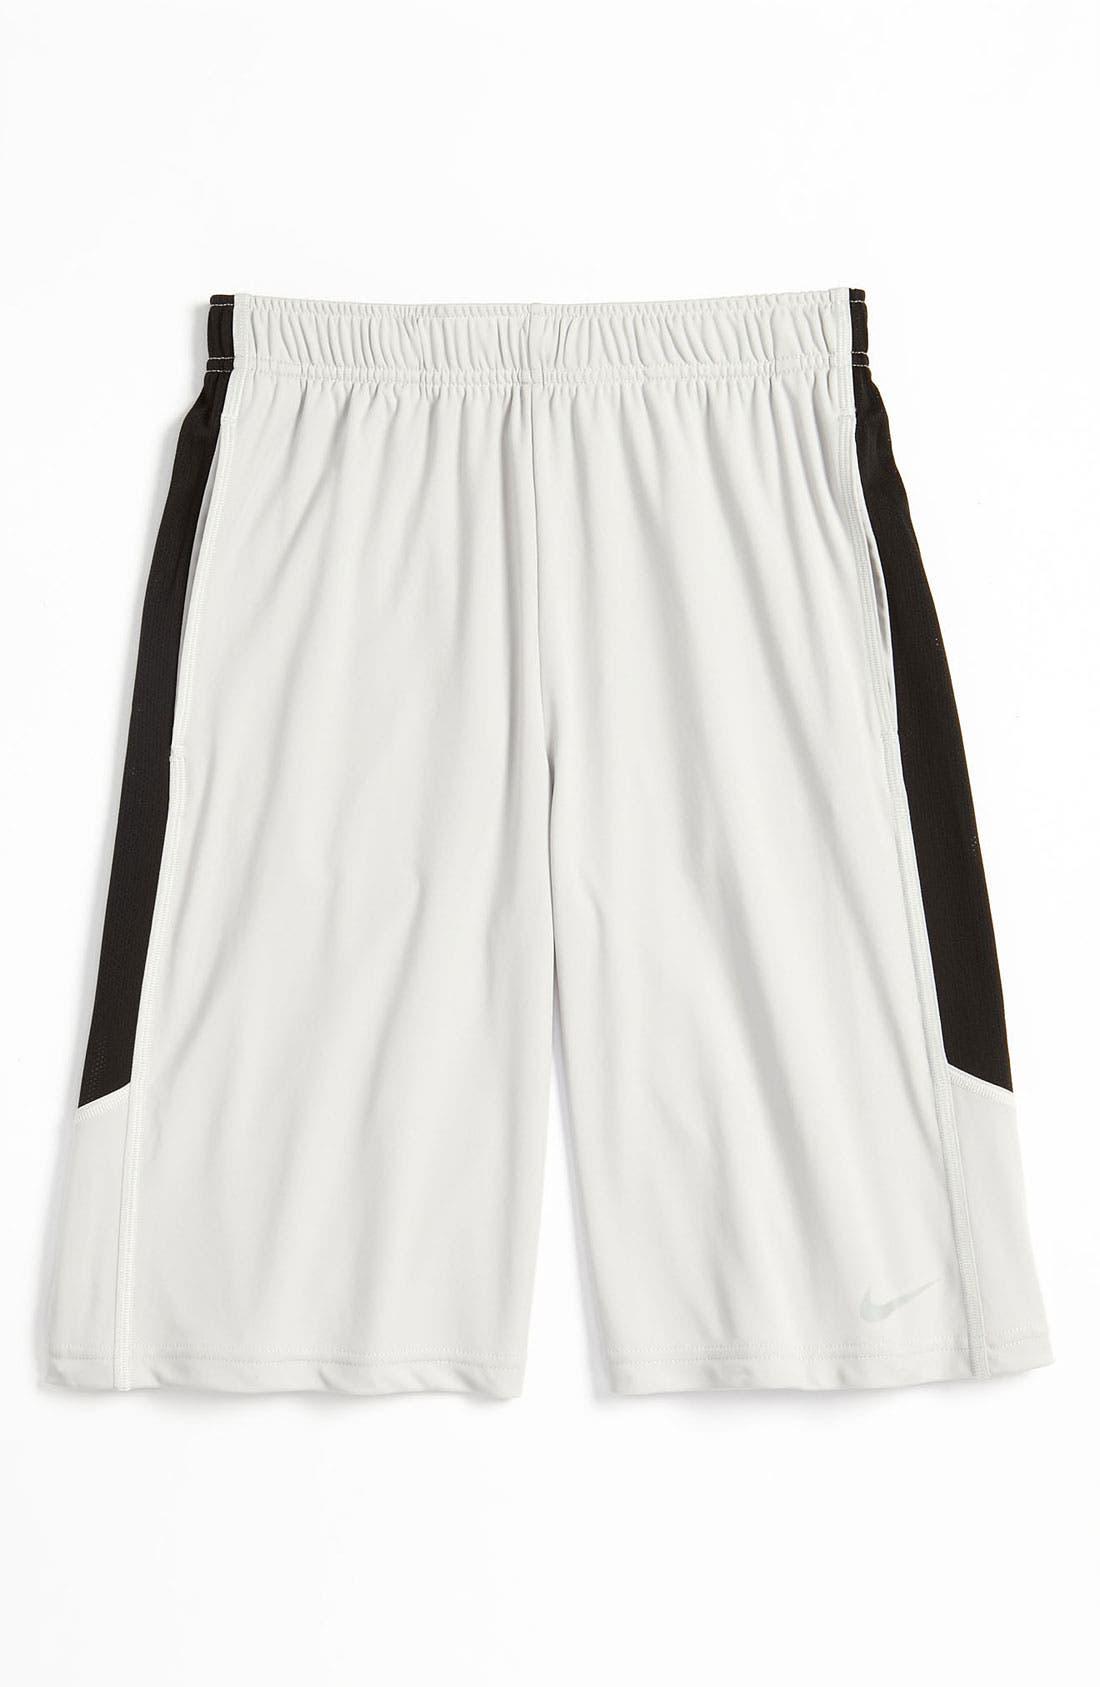 Main Image - Nike 'Lights Out' Shorts (Big Boys)